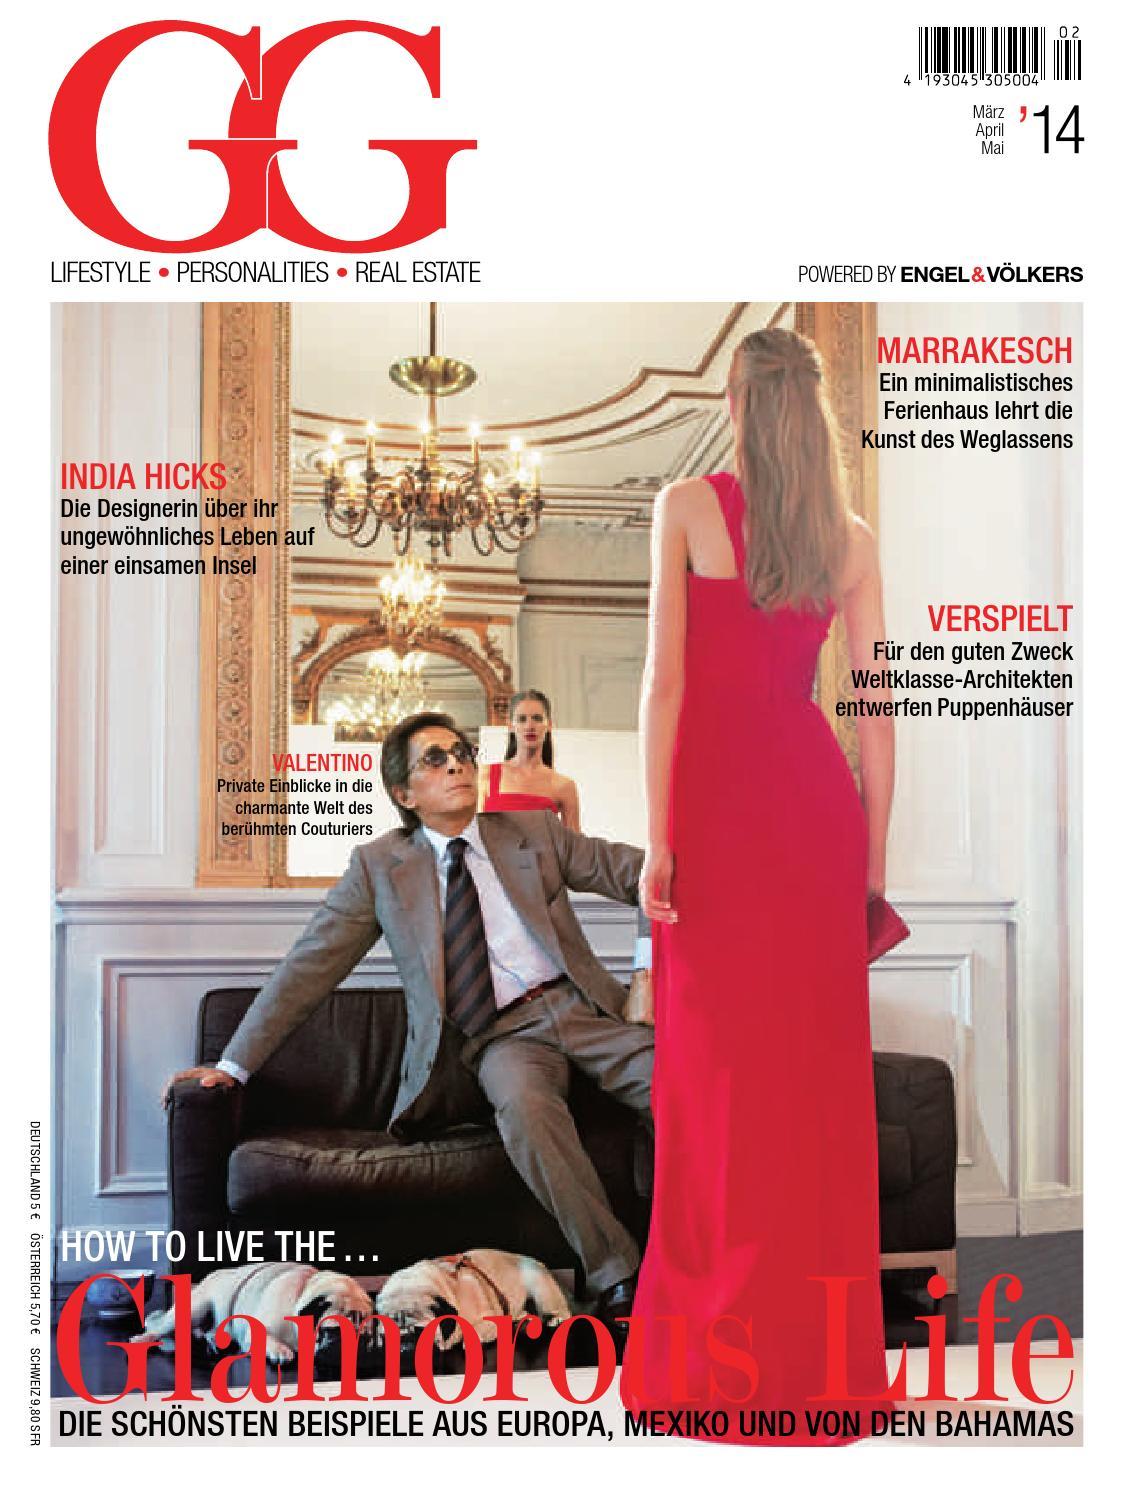 Gg Magazine 02/2014 (German) By Gg-Magazine - Issuu